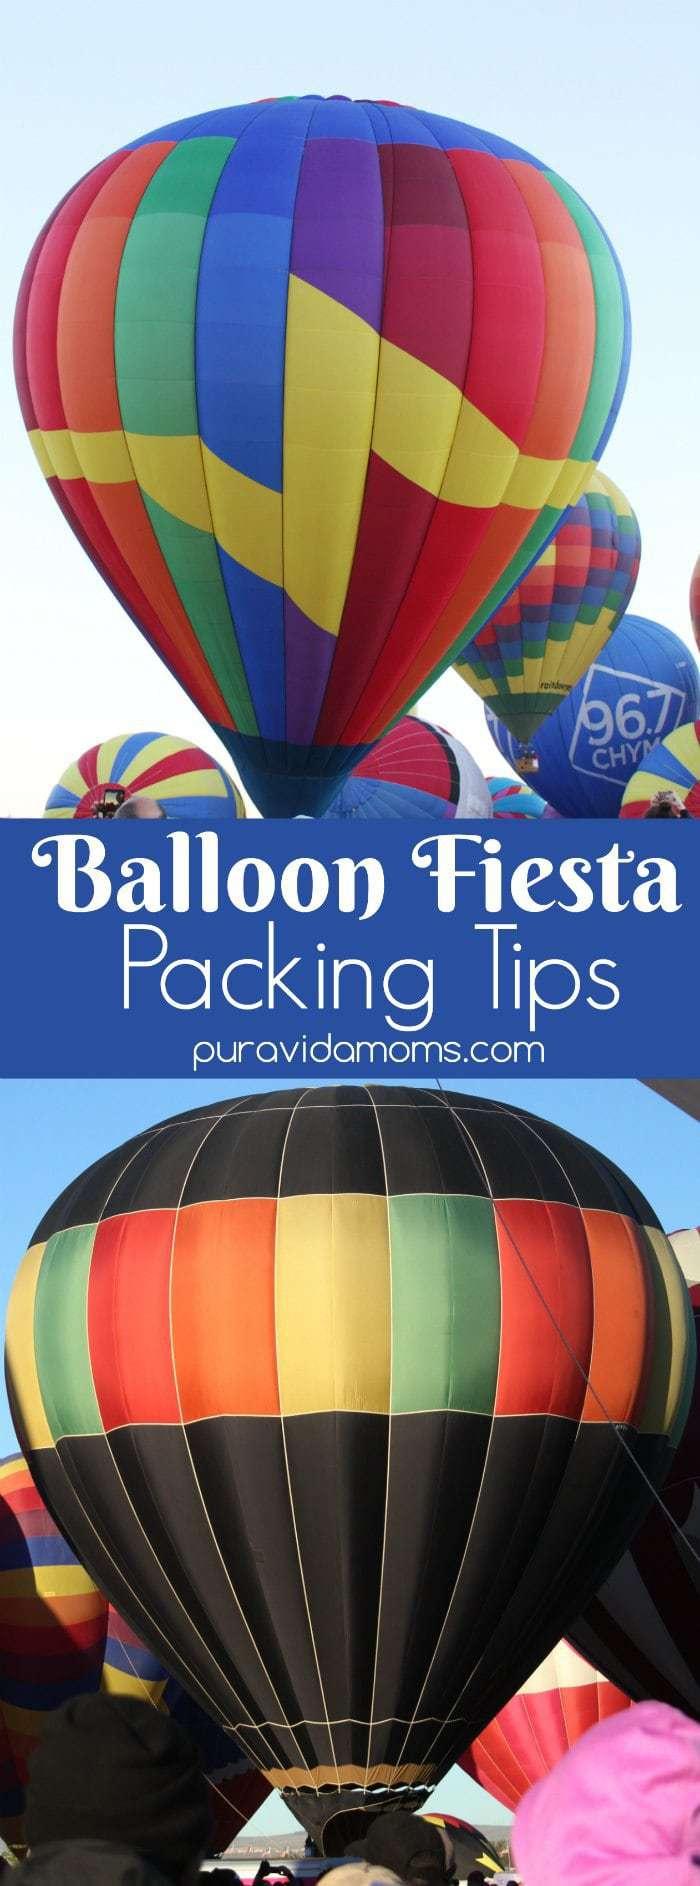 Balloon Fiesta Packing Tips